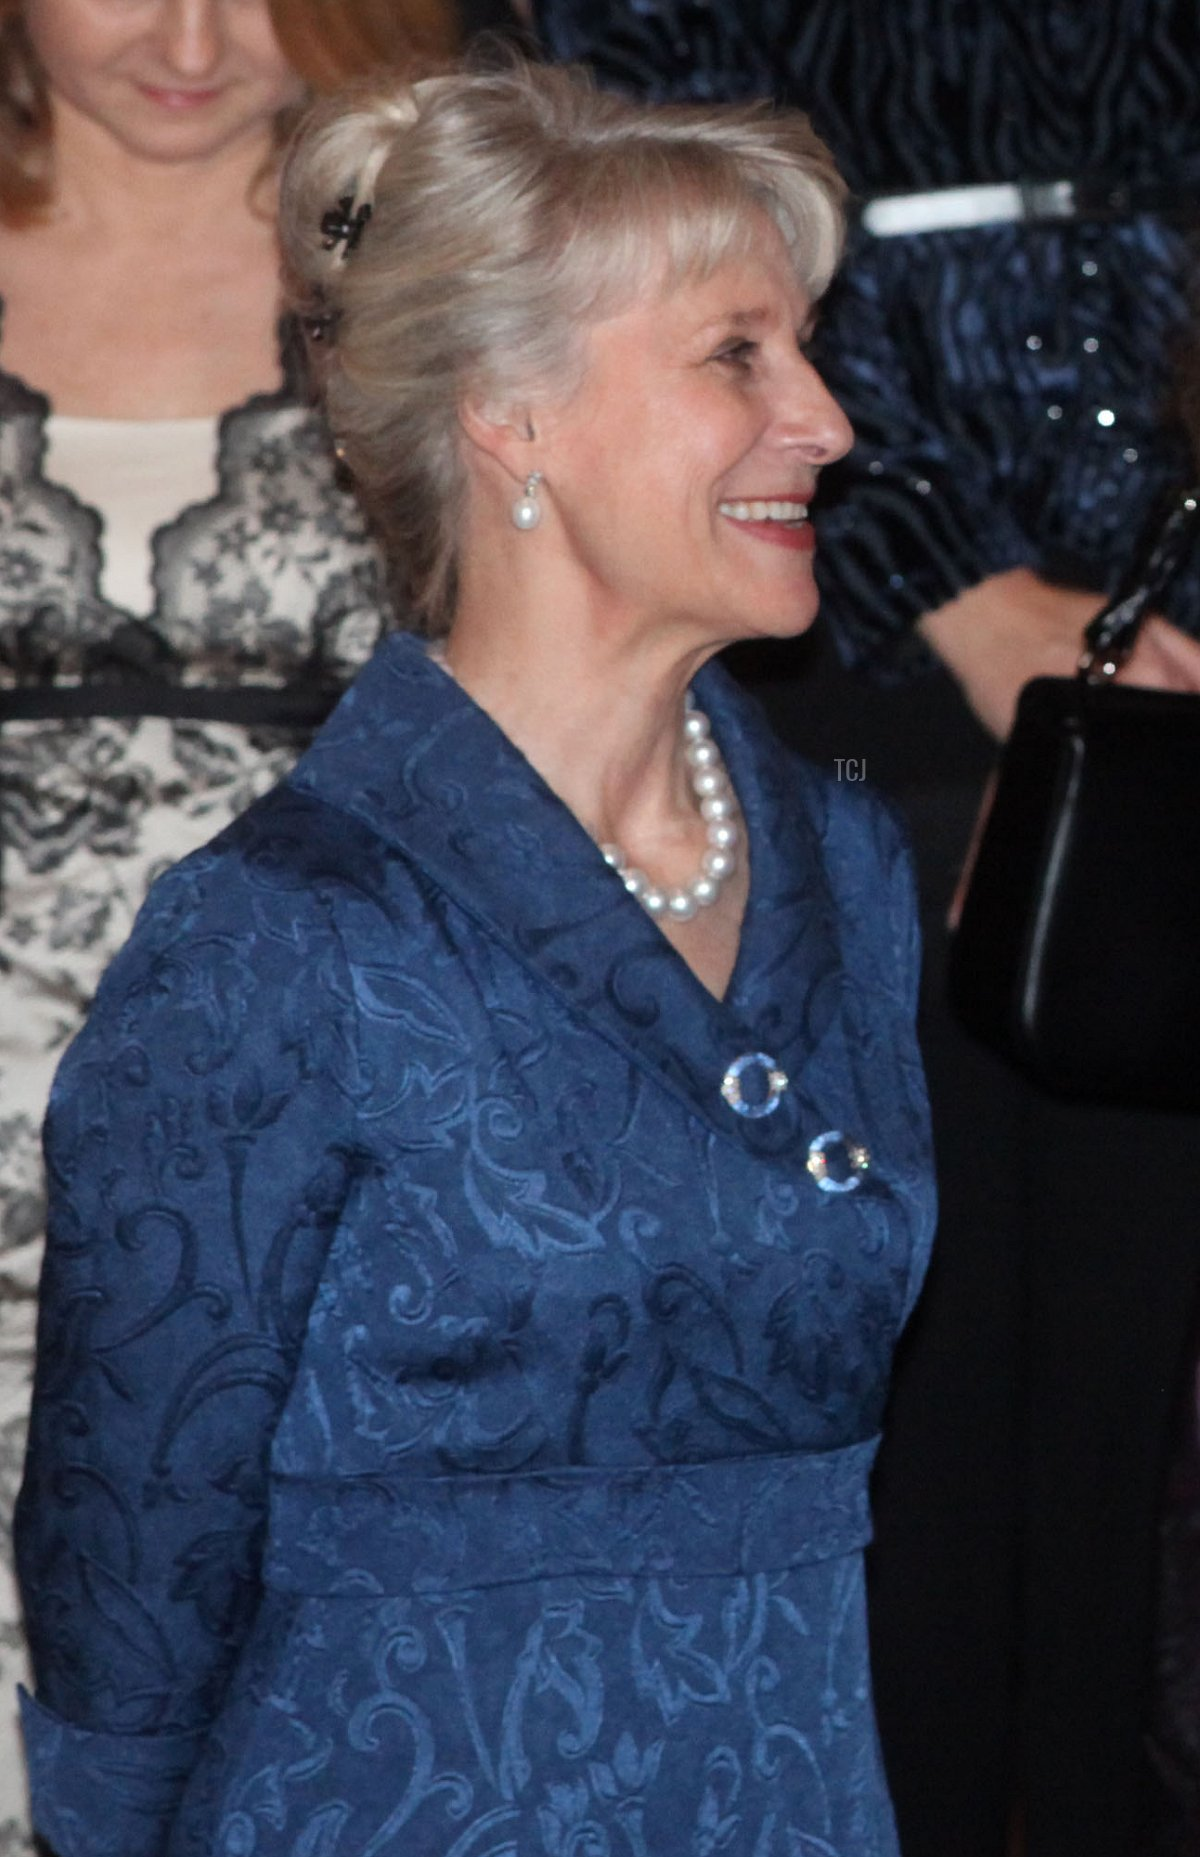 The Duchess of Gloucester attends a concert at Laeken Castle at Laeken Castle on November 16, 2010 in Brussels, Belgium